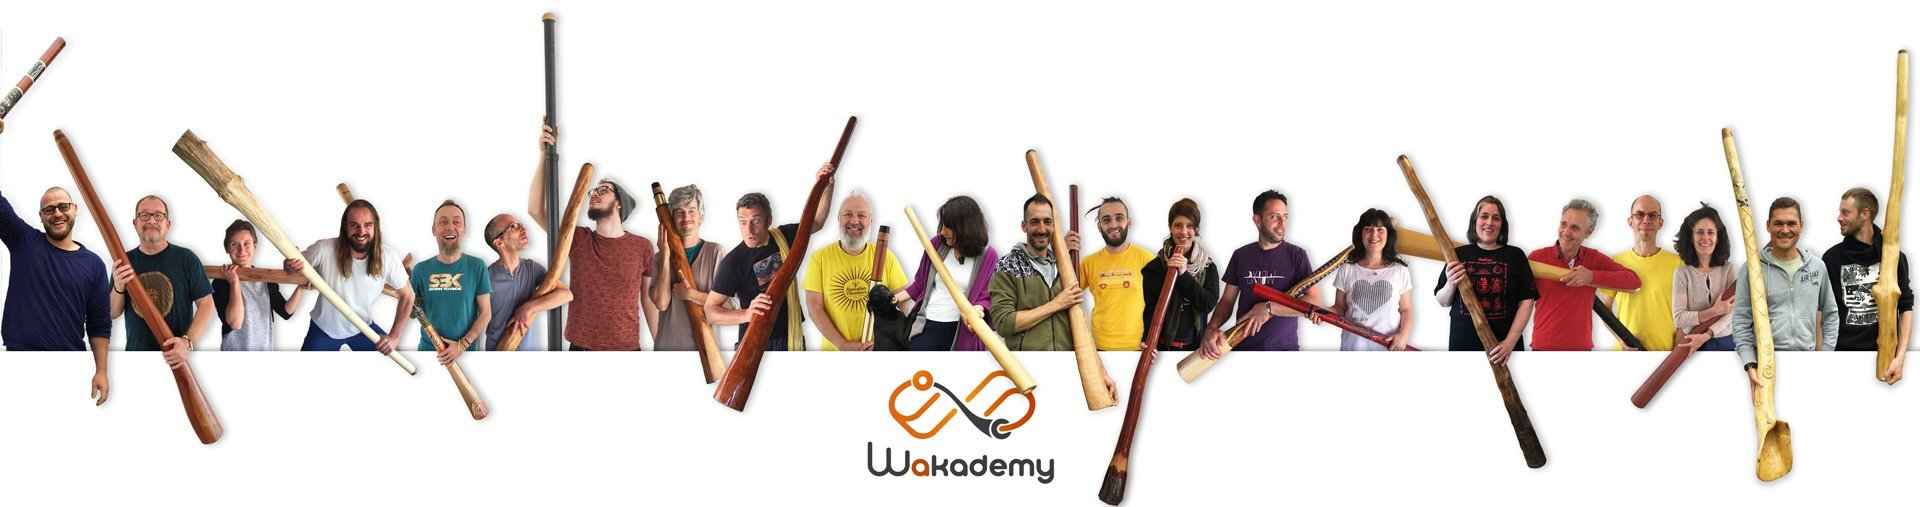 joueuses et joueurs de didgeridoo avec leurs instruments